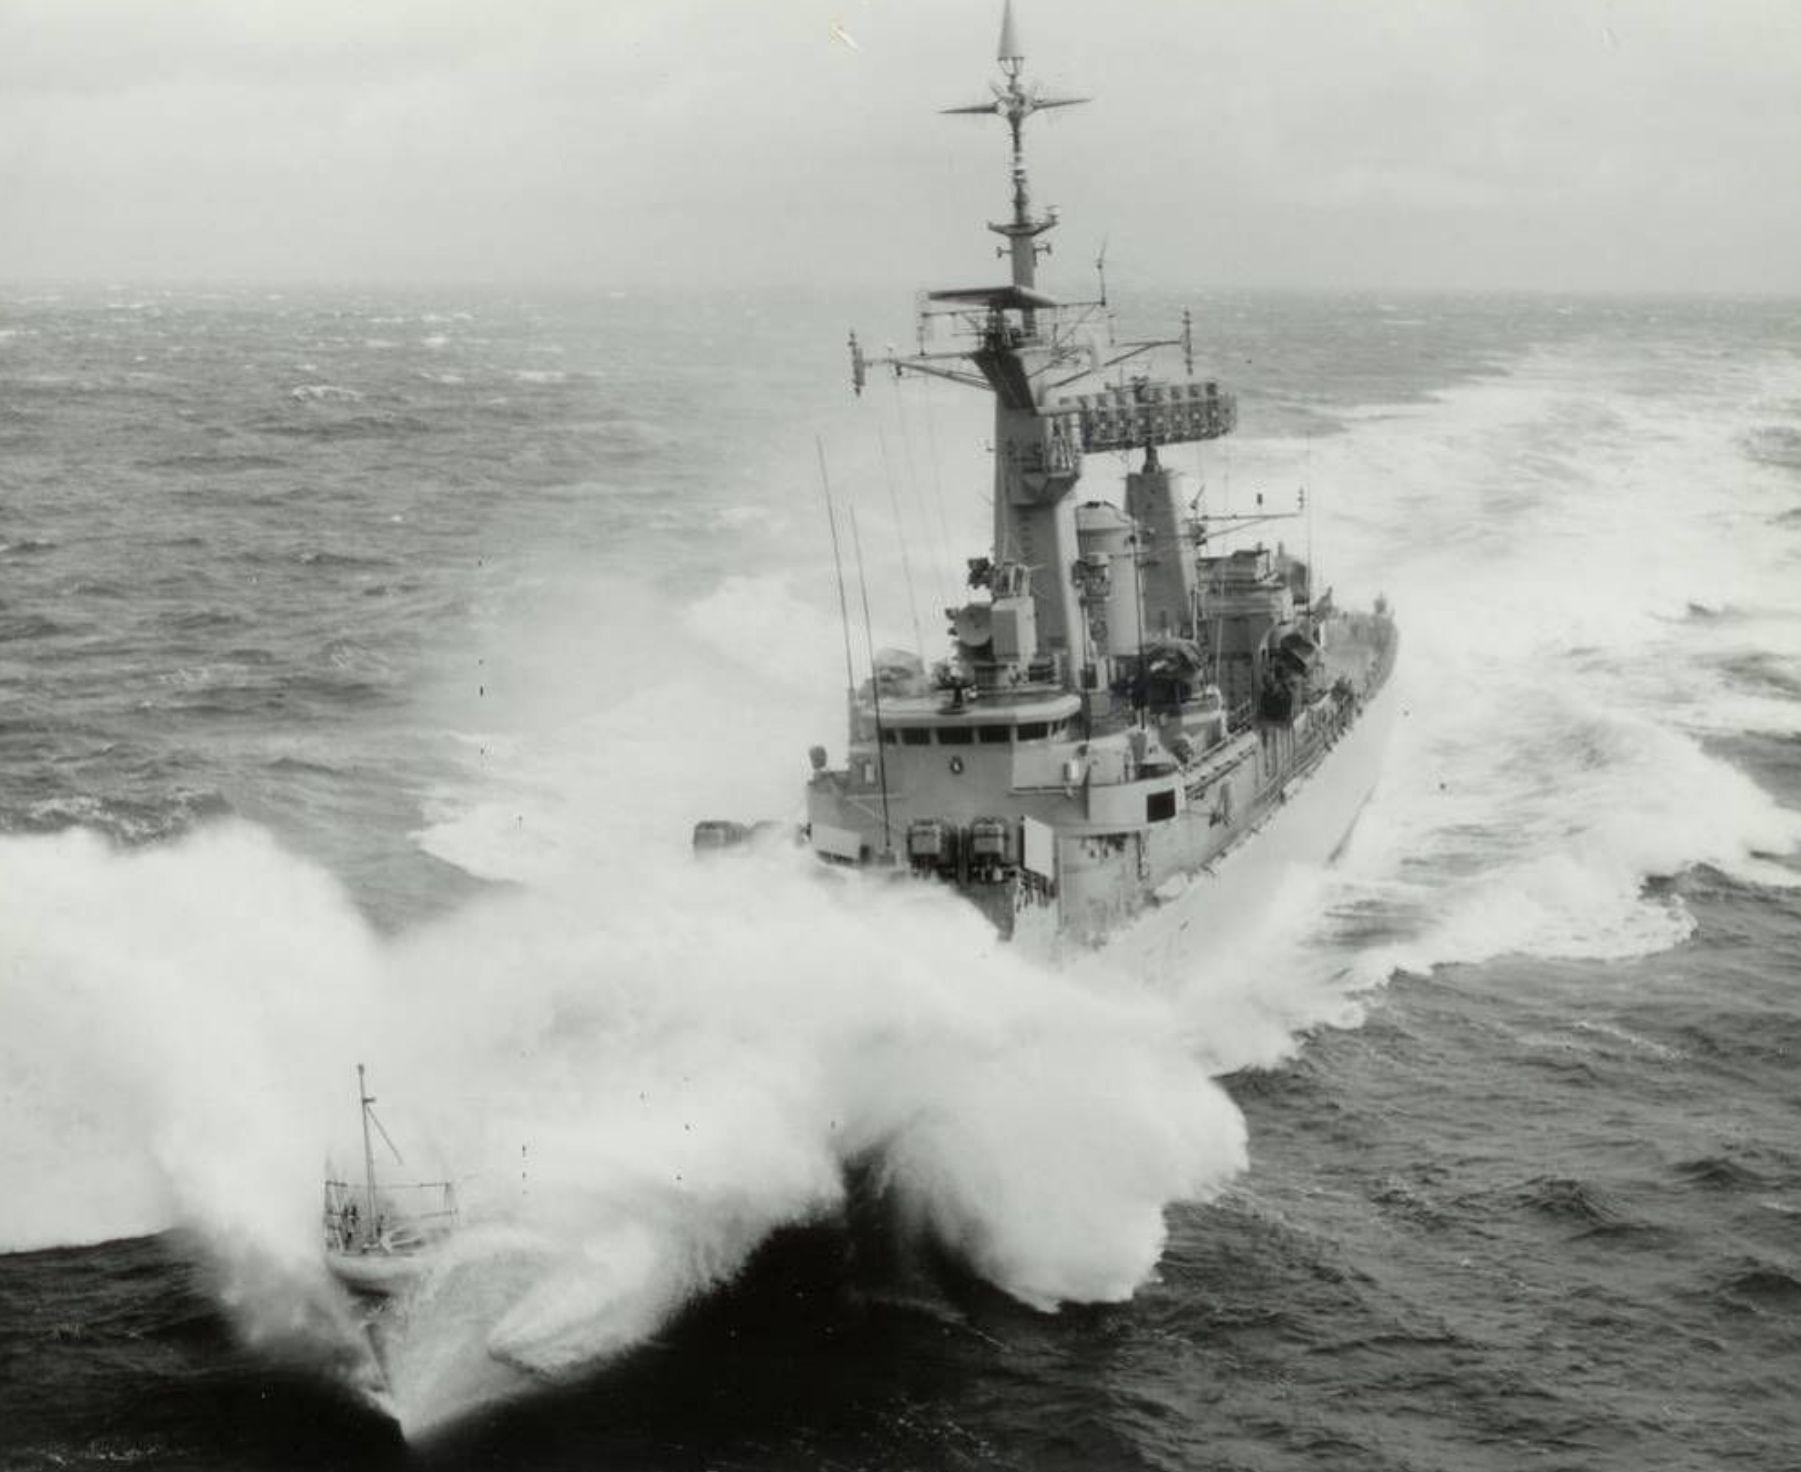 Leander In Rough Seas Royal Navy Ships Navy Day Navy Ships